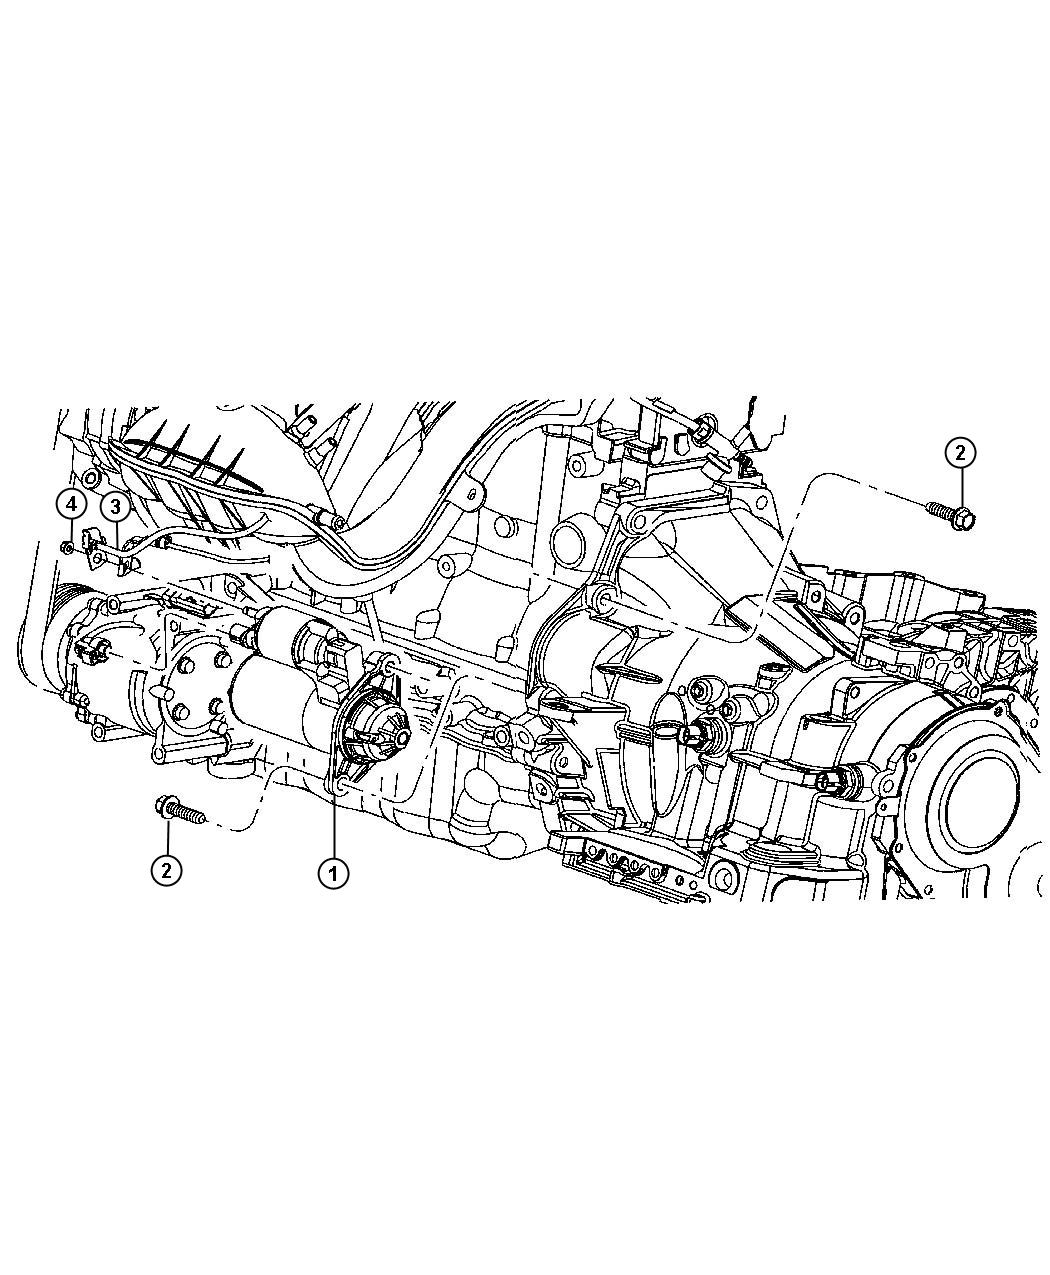 Dodge Stratus Starter  Engine